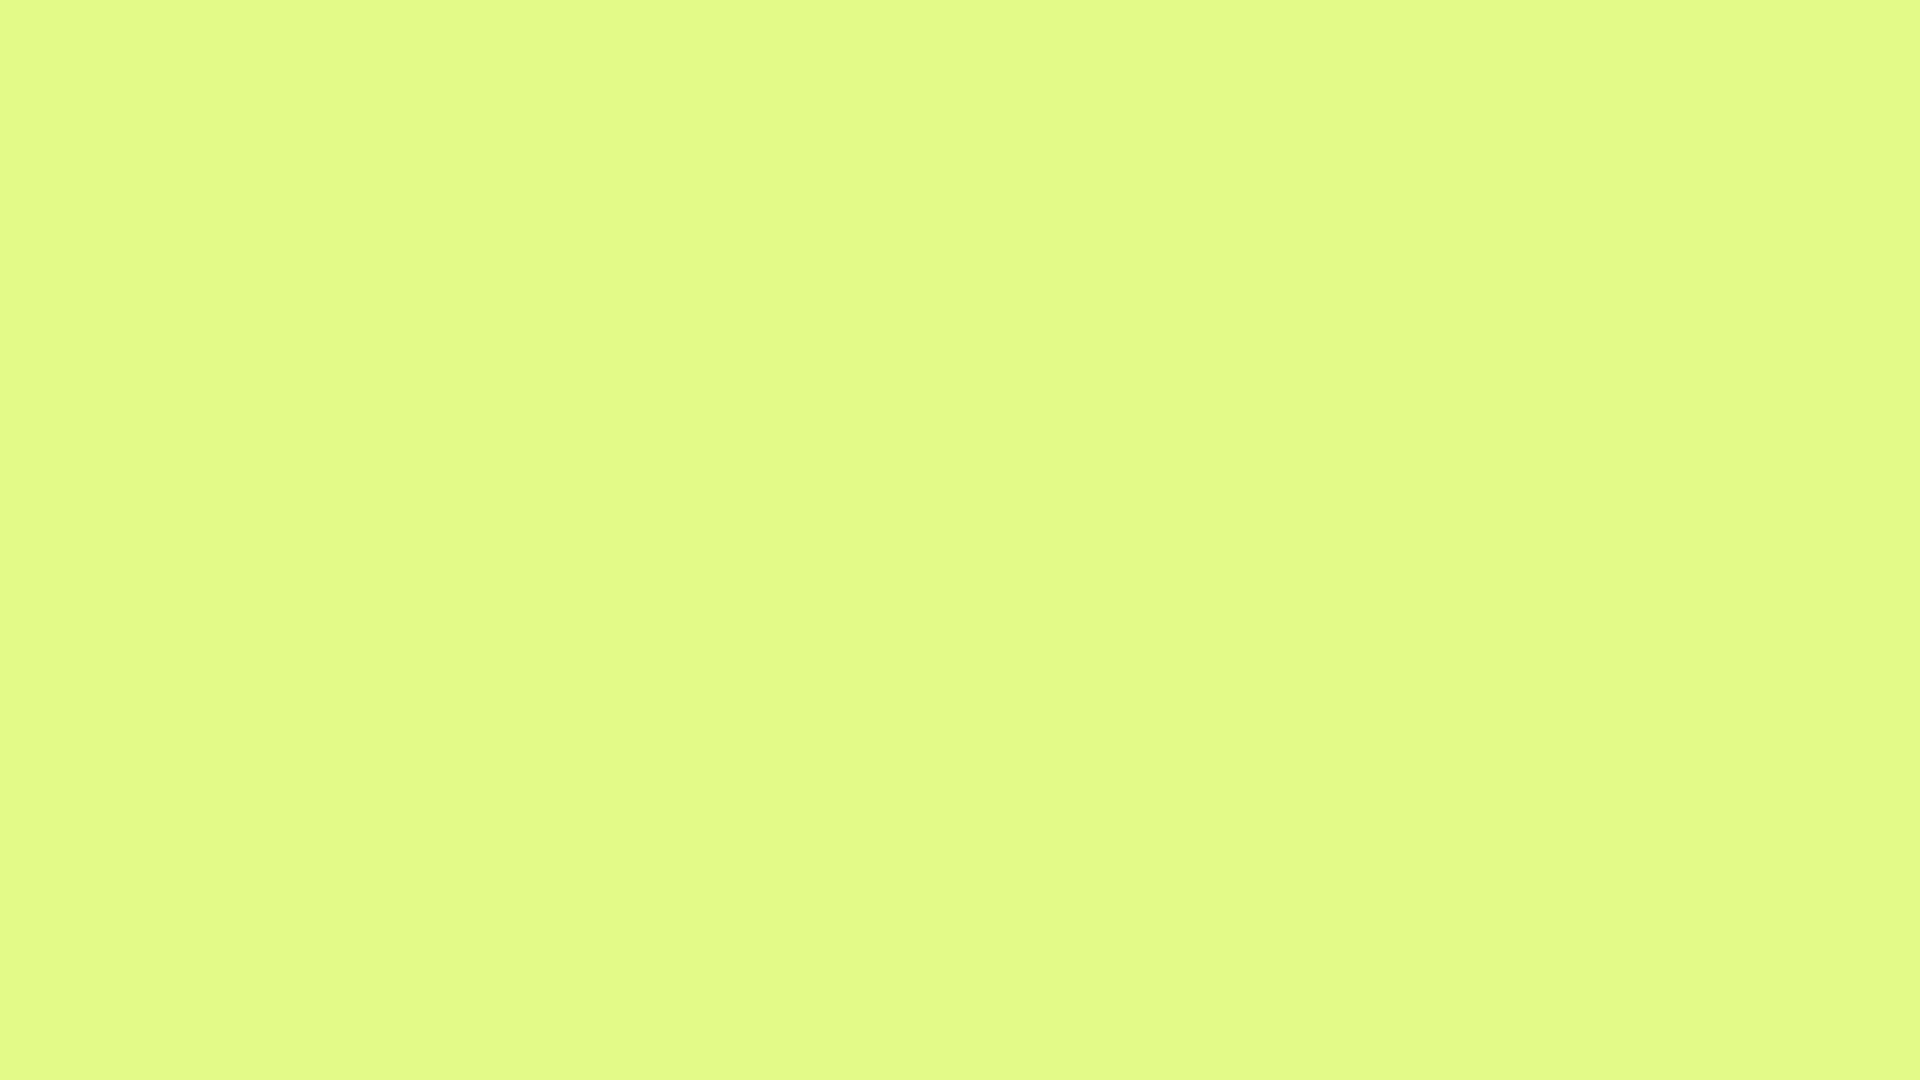 1920x1080 Midori Solid Color Background